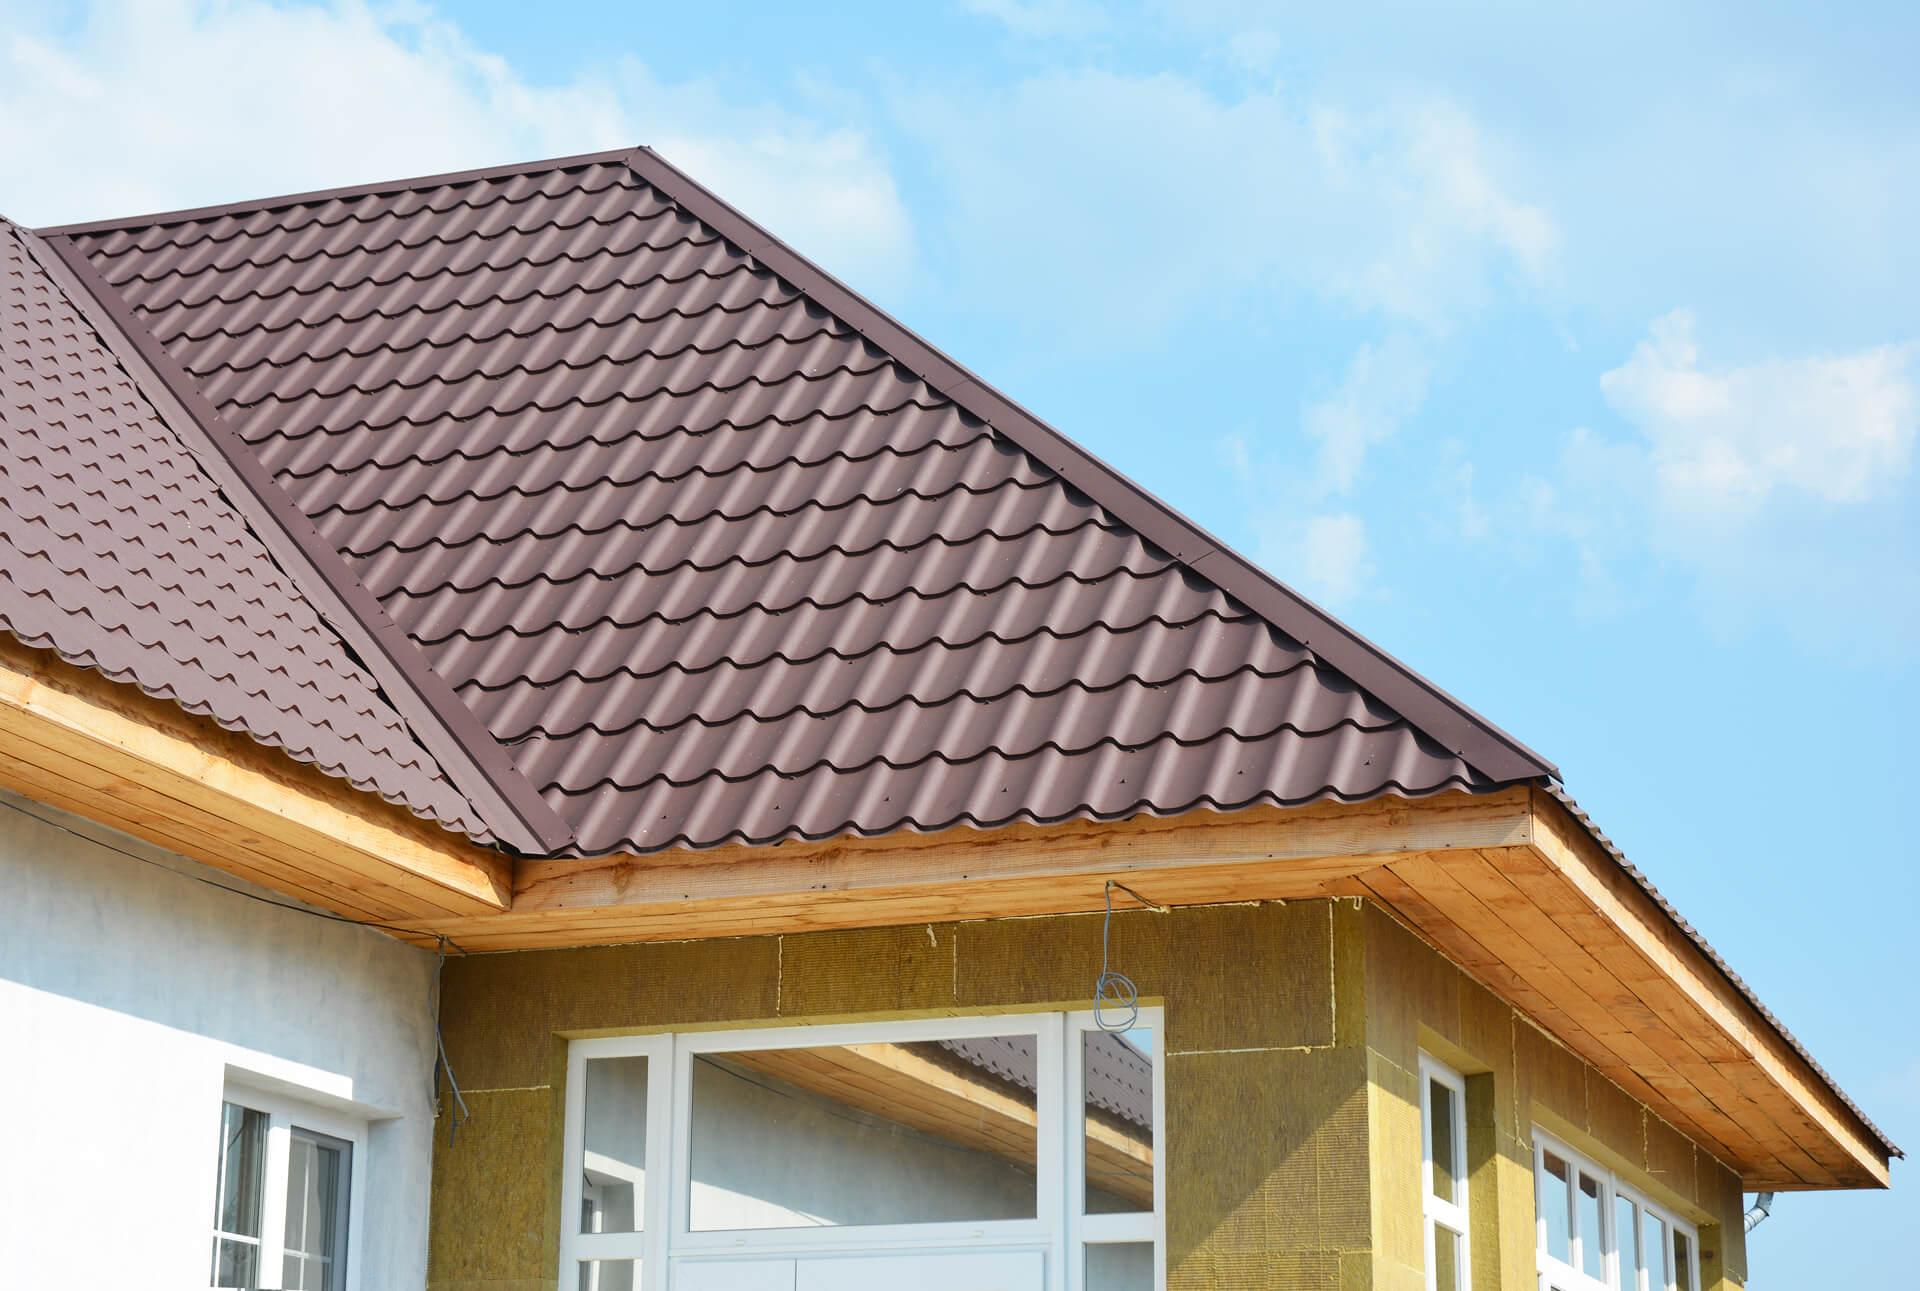 Terre roofers